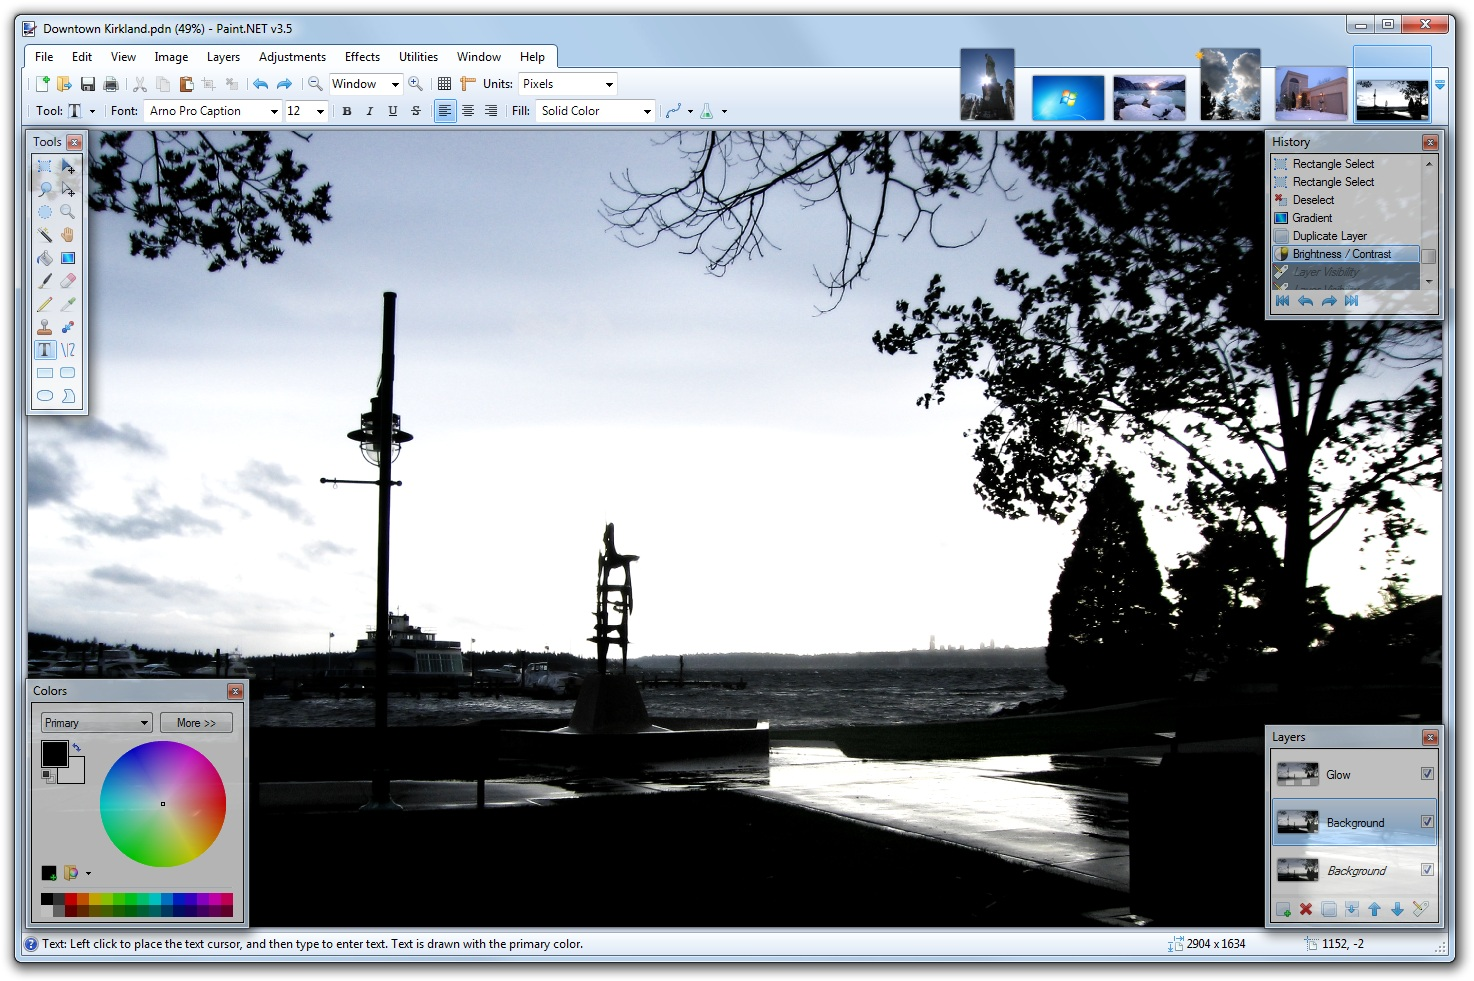 Paint.NET 4.0.16 free photo editor